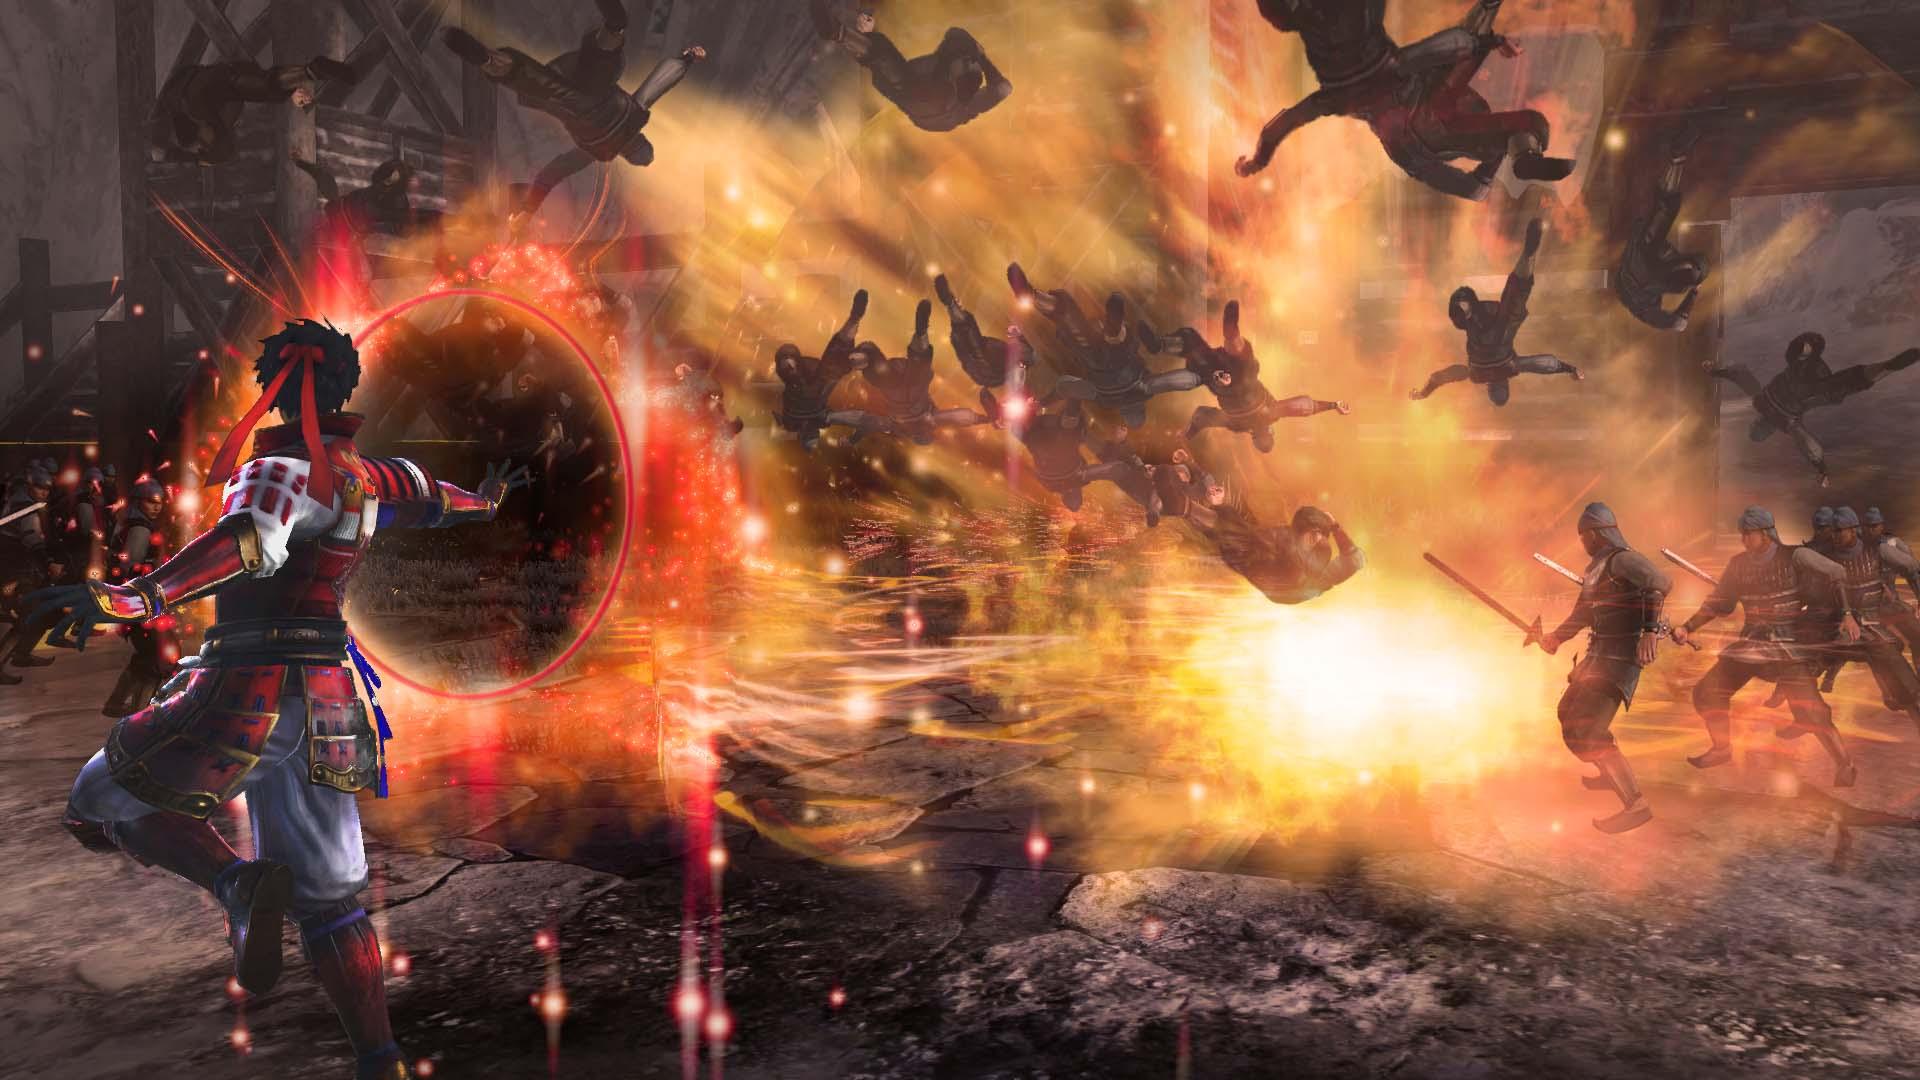 Warriors-Orochi-4-koei-tecmo-sortie